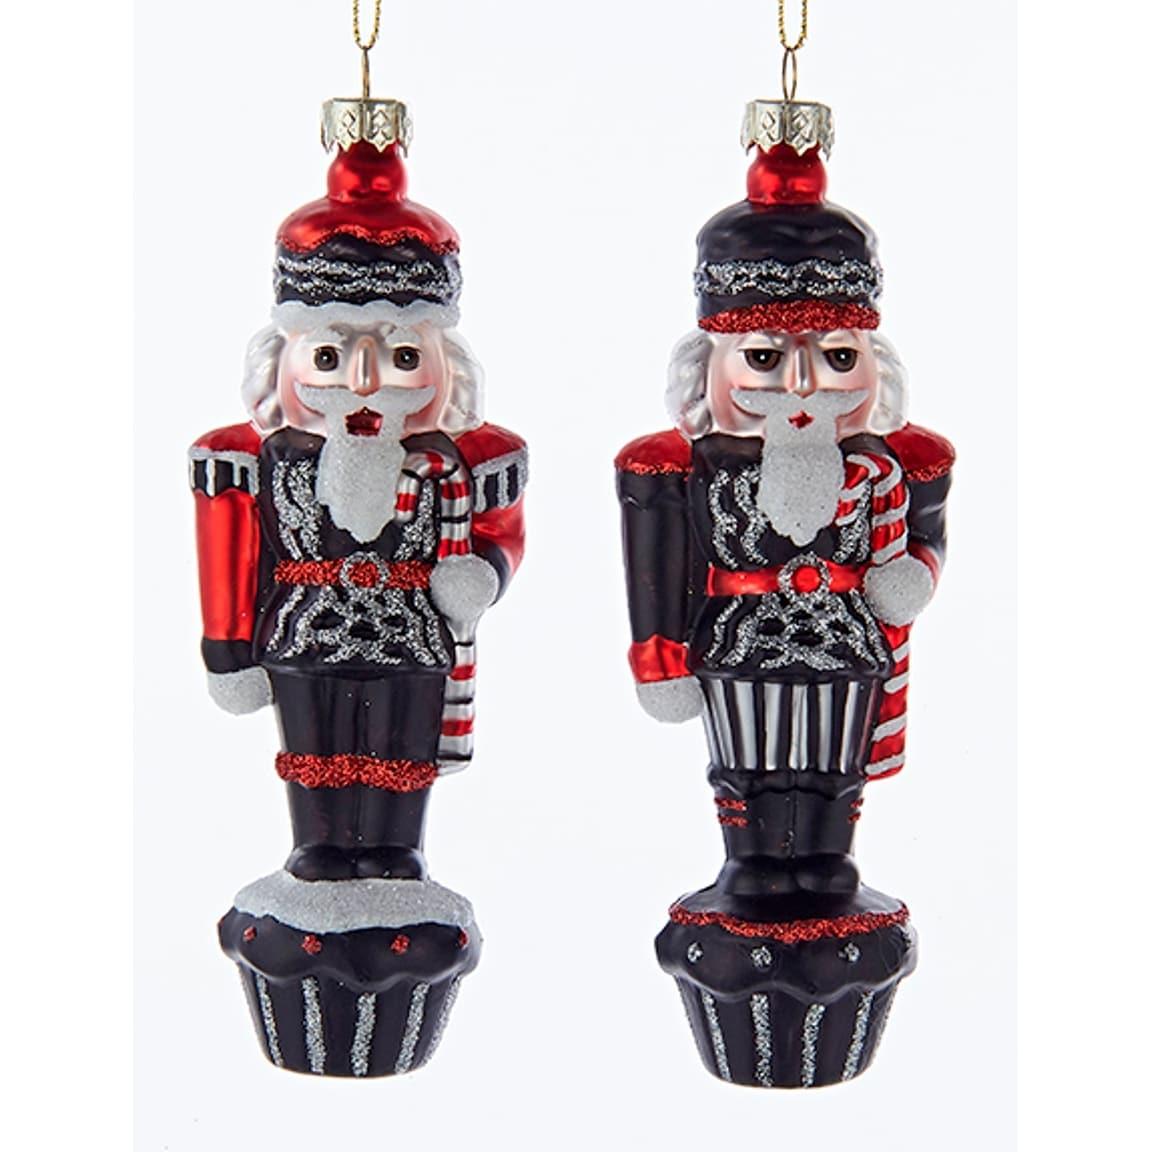 Shop Kurt Adler Chalkboard Black Red Nutcrackers Holiday Ornaments ...